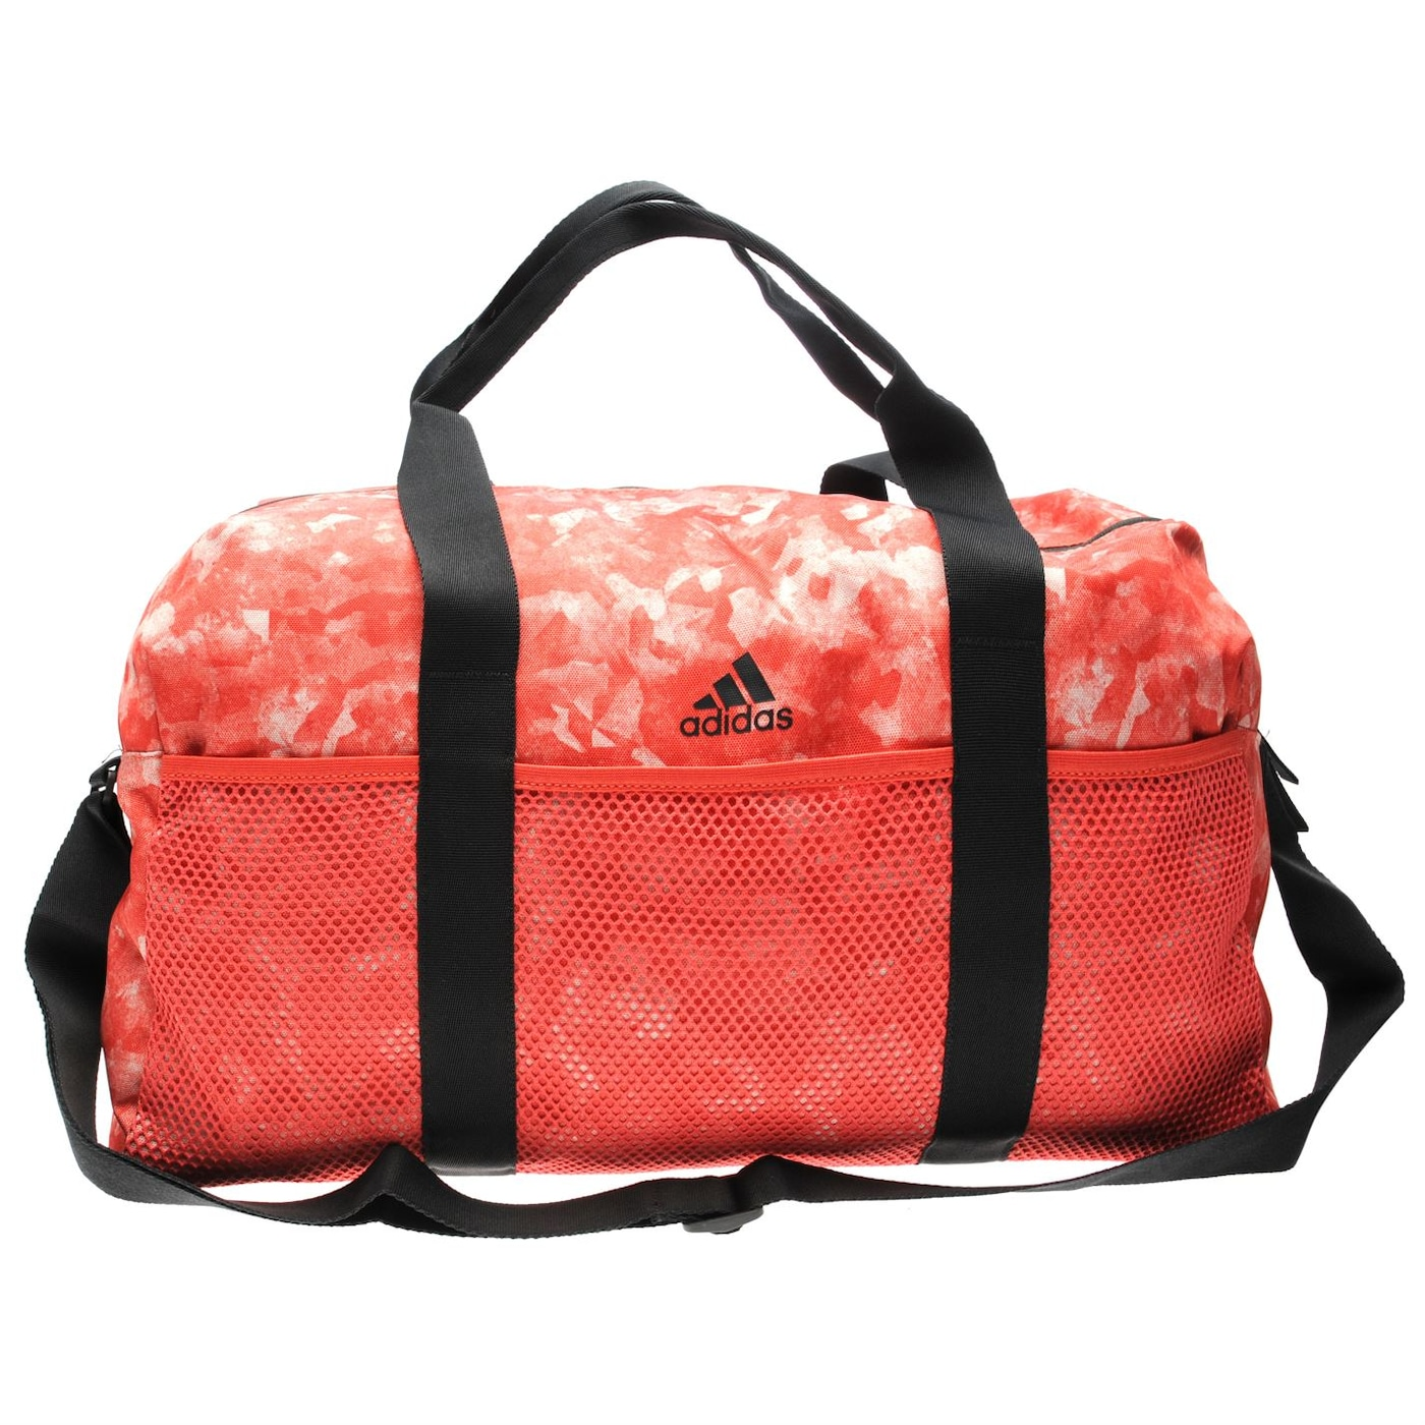 c87ce450c Adidas shoulder bag m66960 levně   Blesk zboží